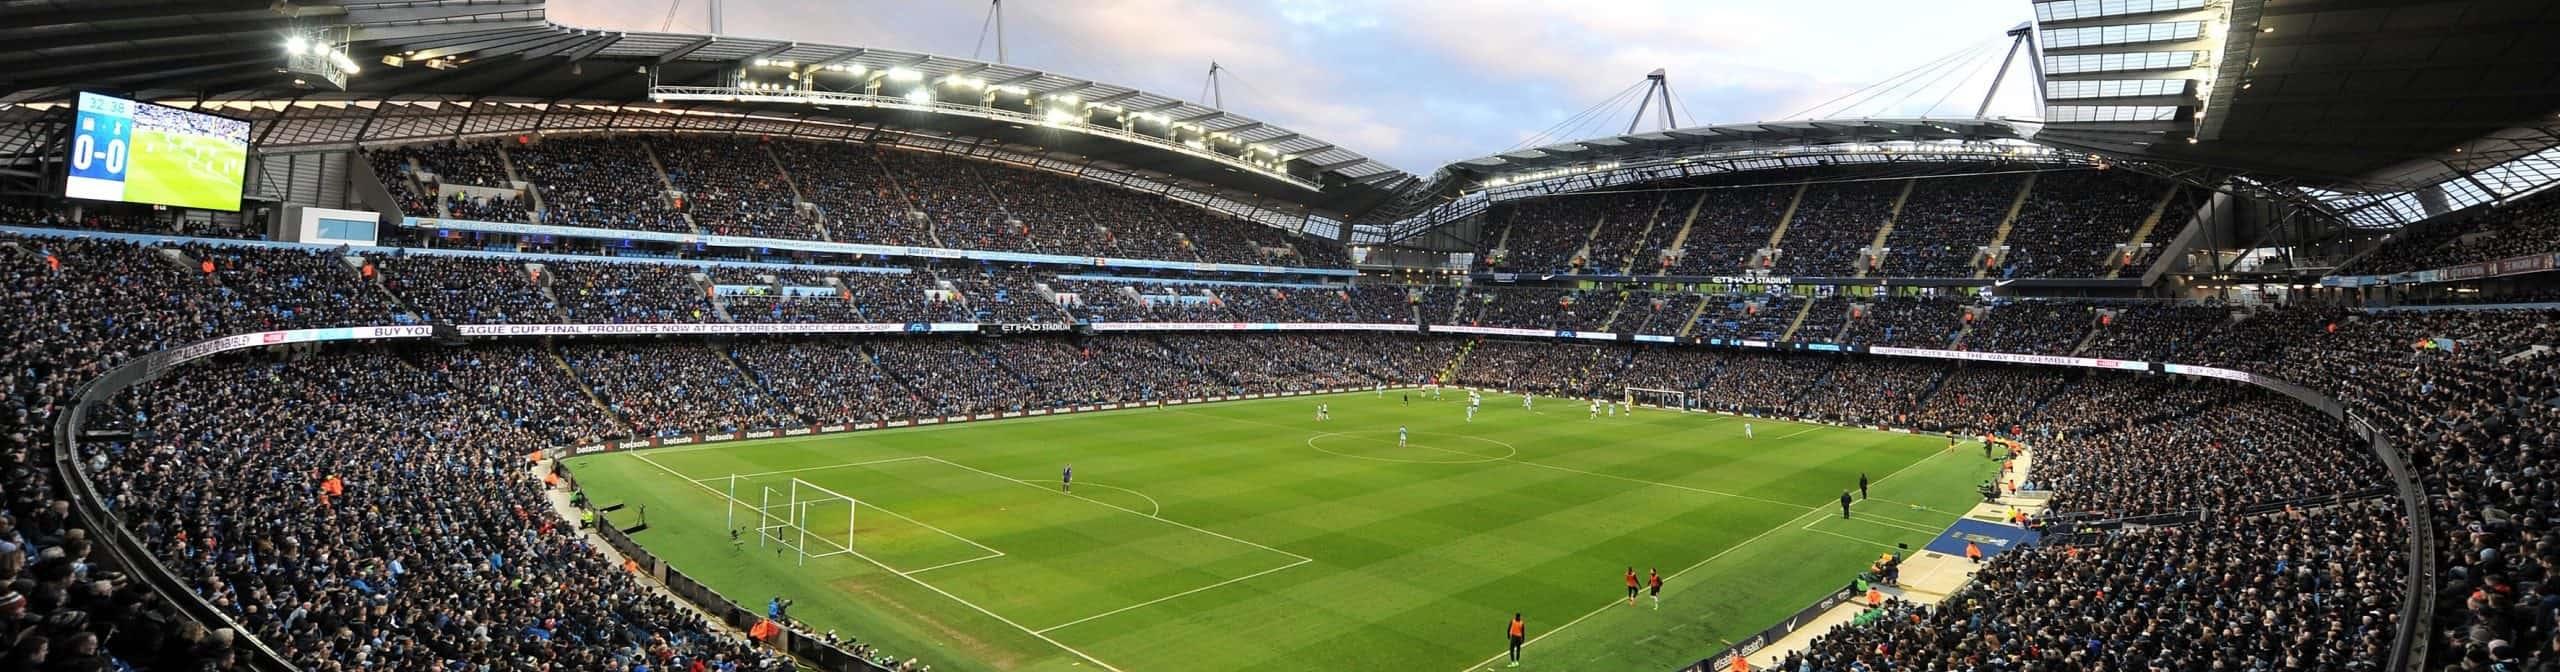 Manchester City Matchday Accommodation